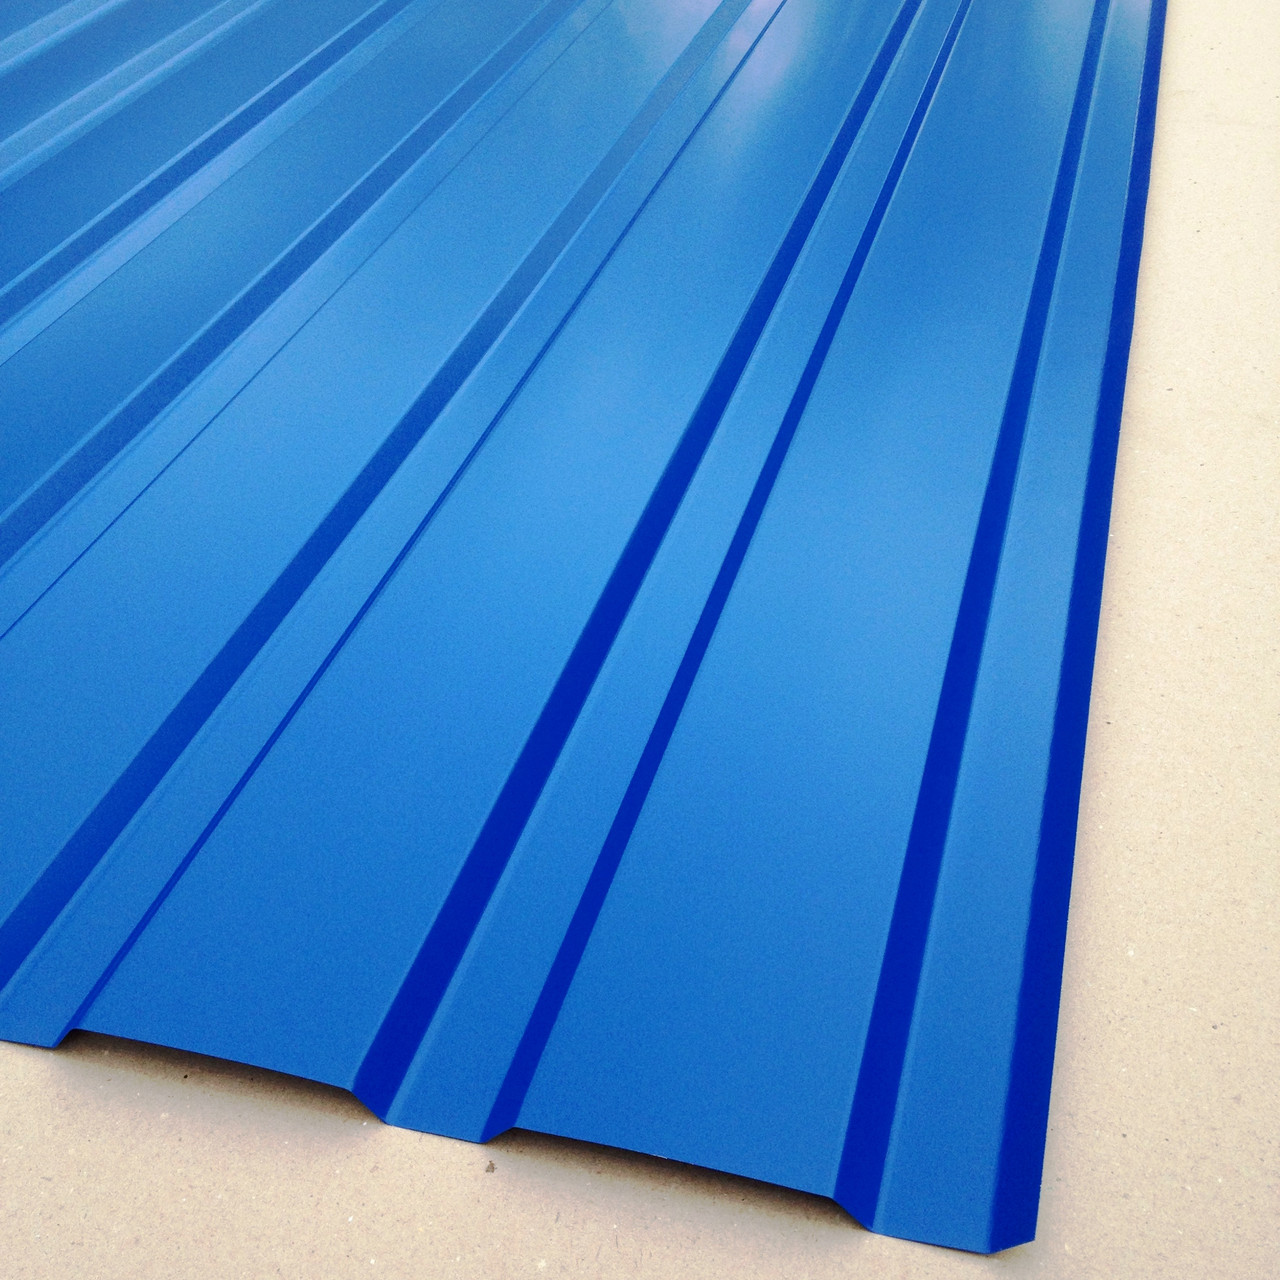 Профнастил  для забора, цвет: синий ПС-20, 0,30мм; высота 1.5 метра ширина 1,16 м